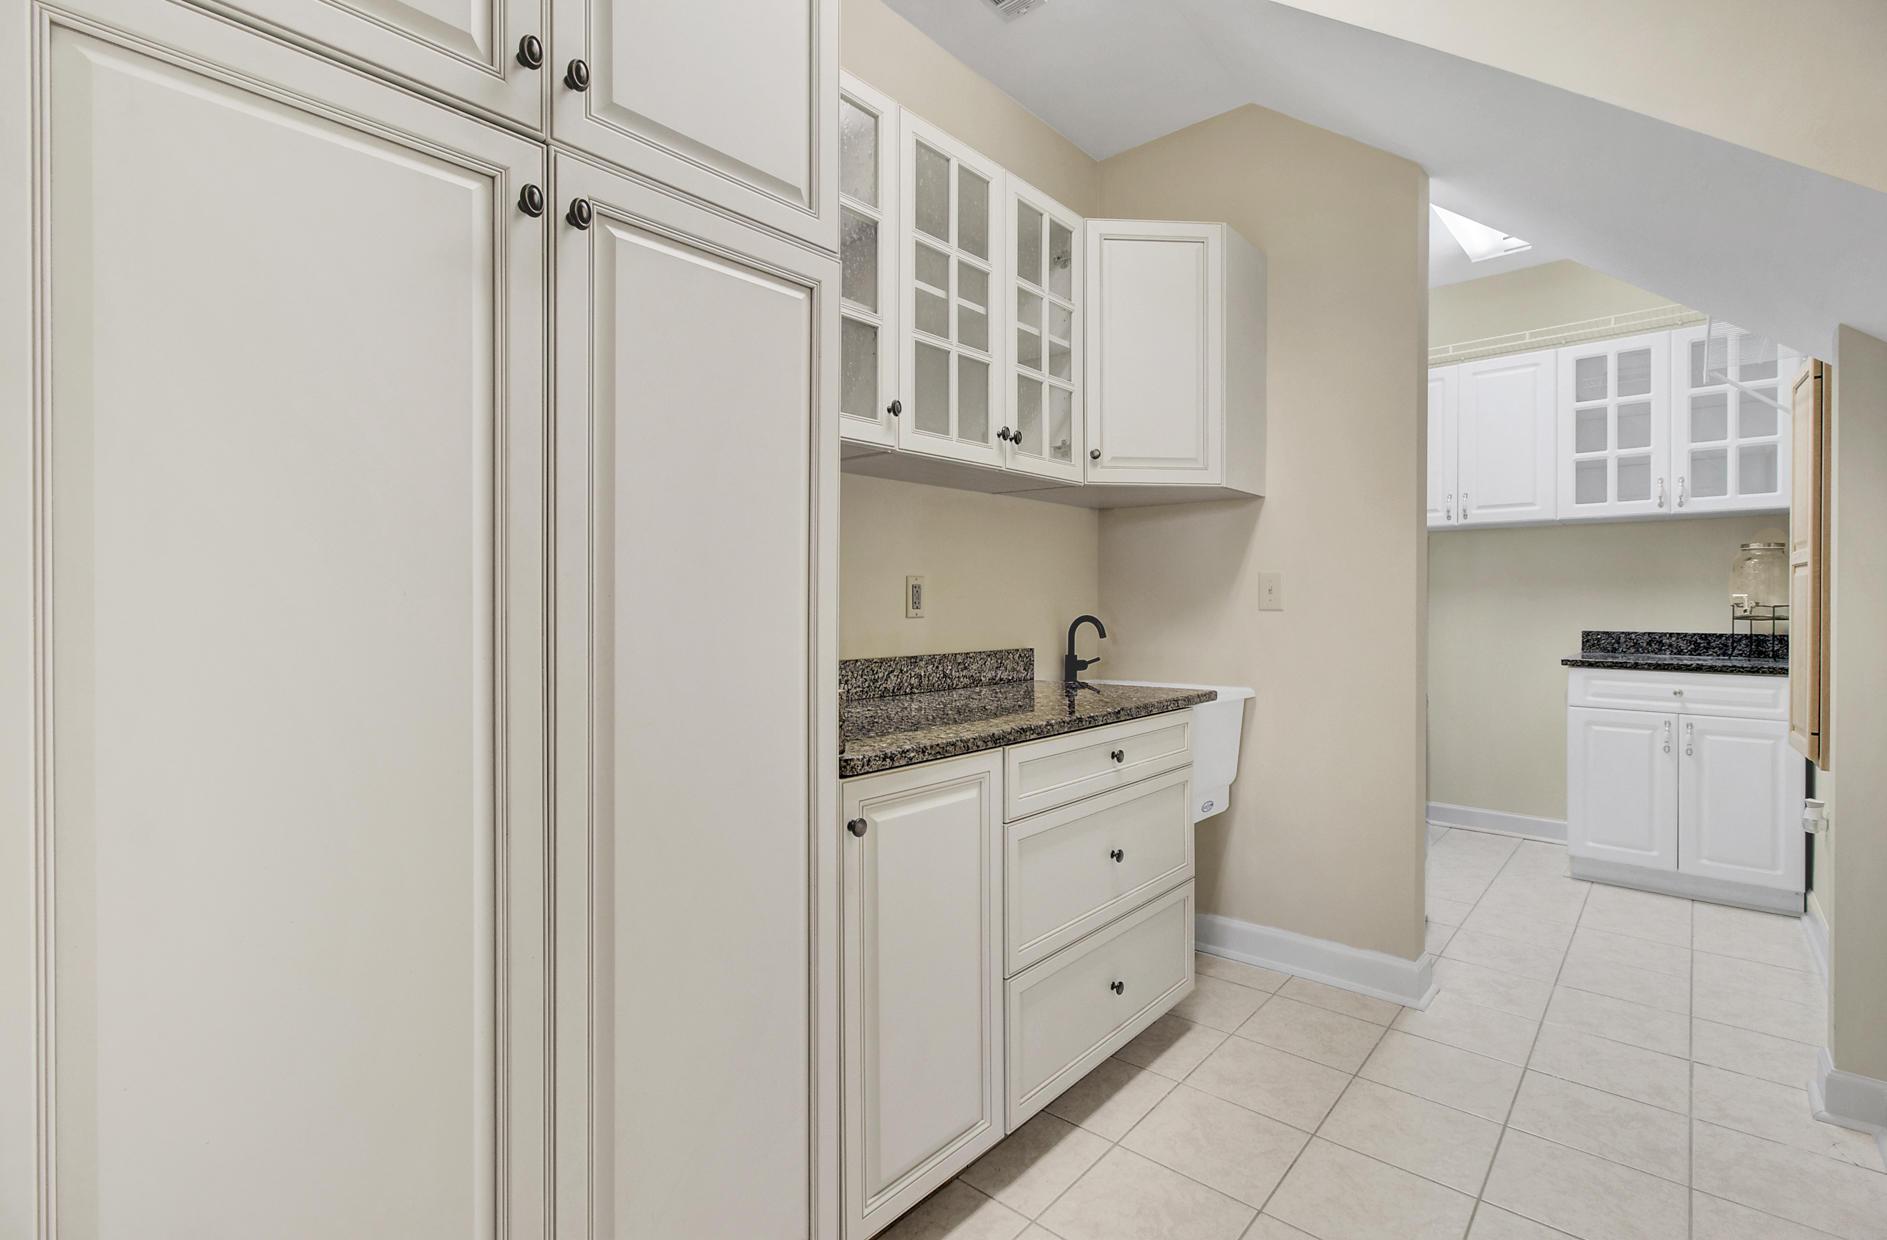 Dunes West Homes For Sale - 4123 Colonel Vanderhorst, Mount Pleasant, SC - 4